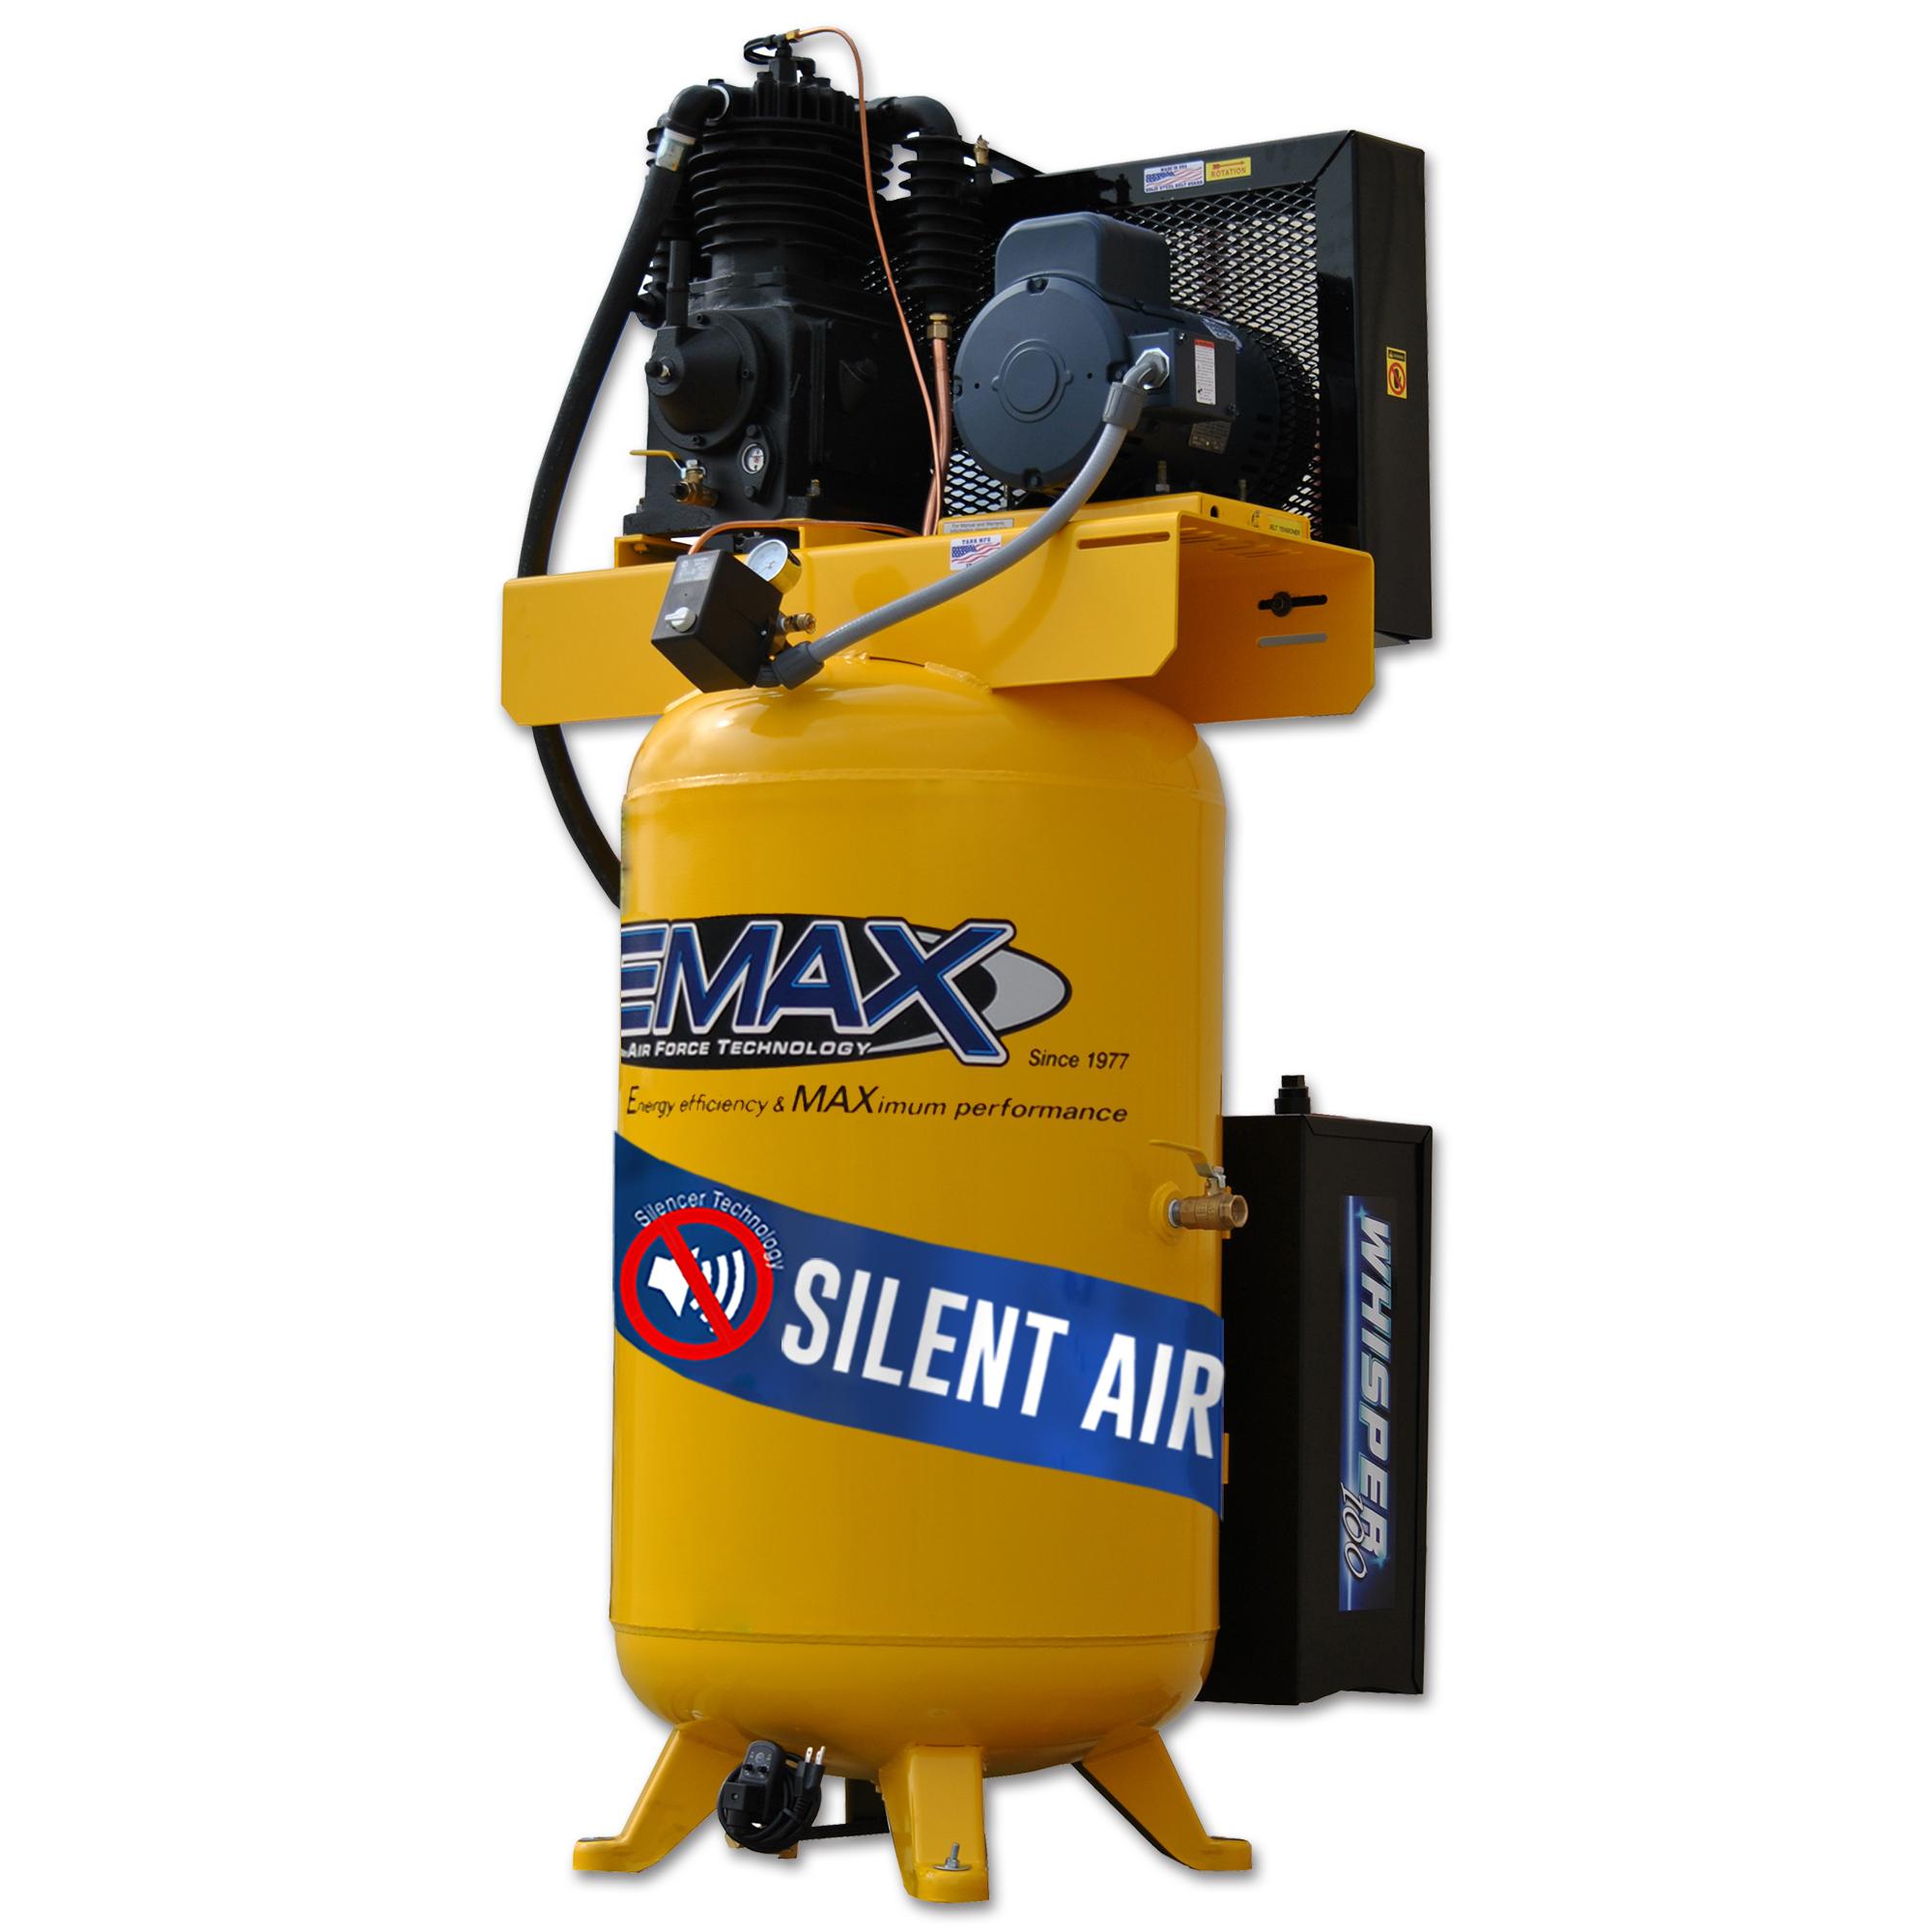 5 HP Air Compressor, 80 Gallon, 1 Phase, Silent Air System